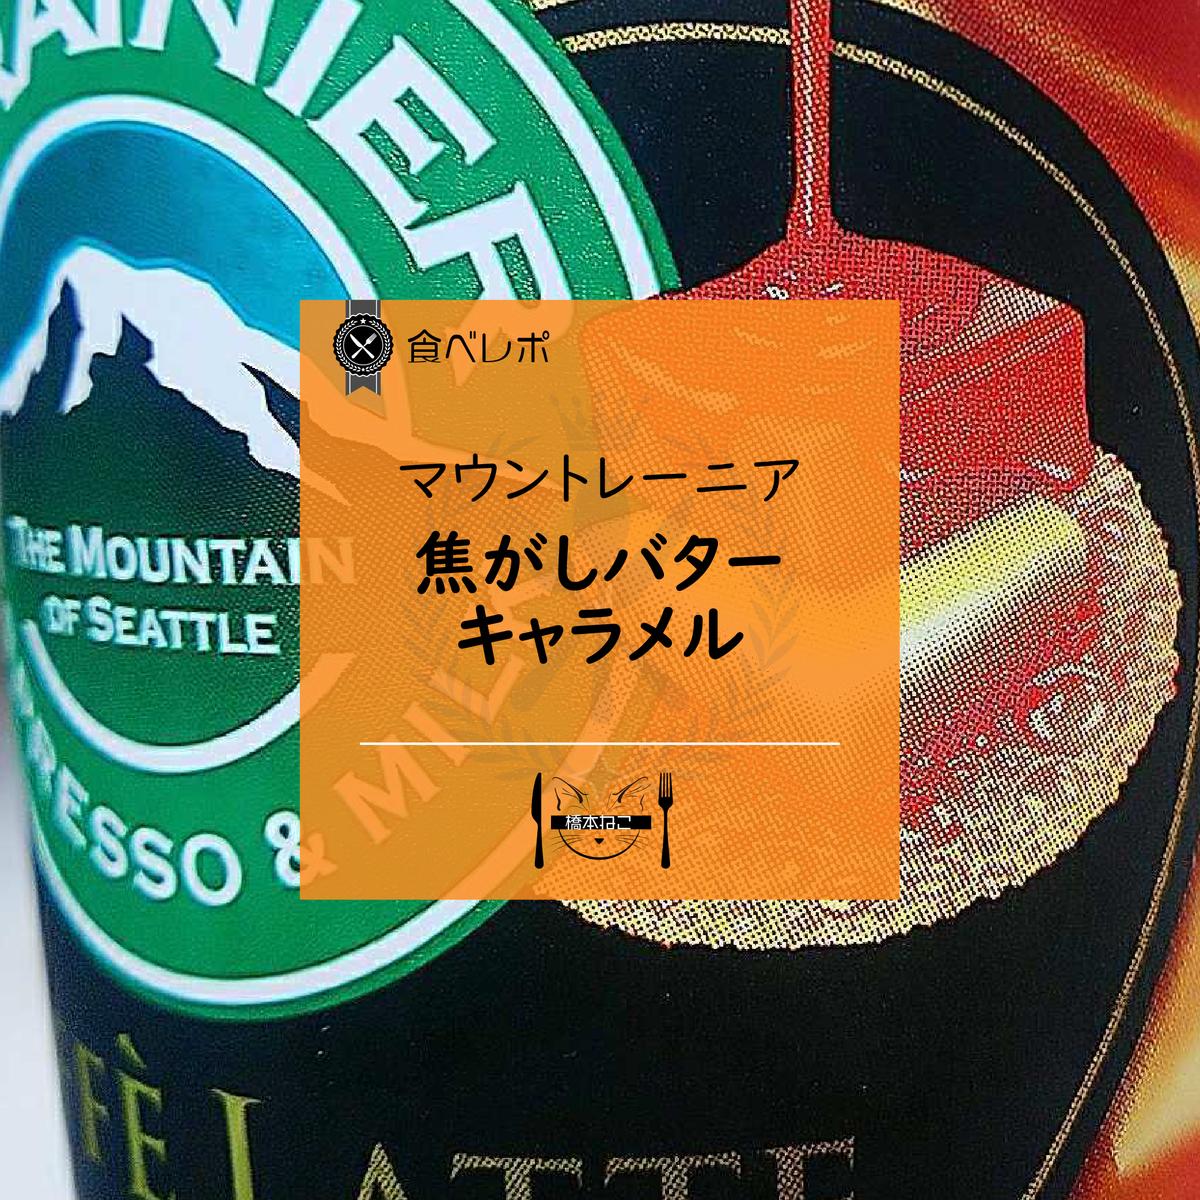 f:id:hashimoto_neko:20201014154412p:plain